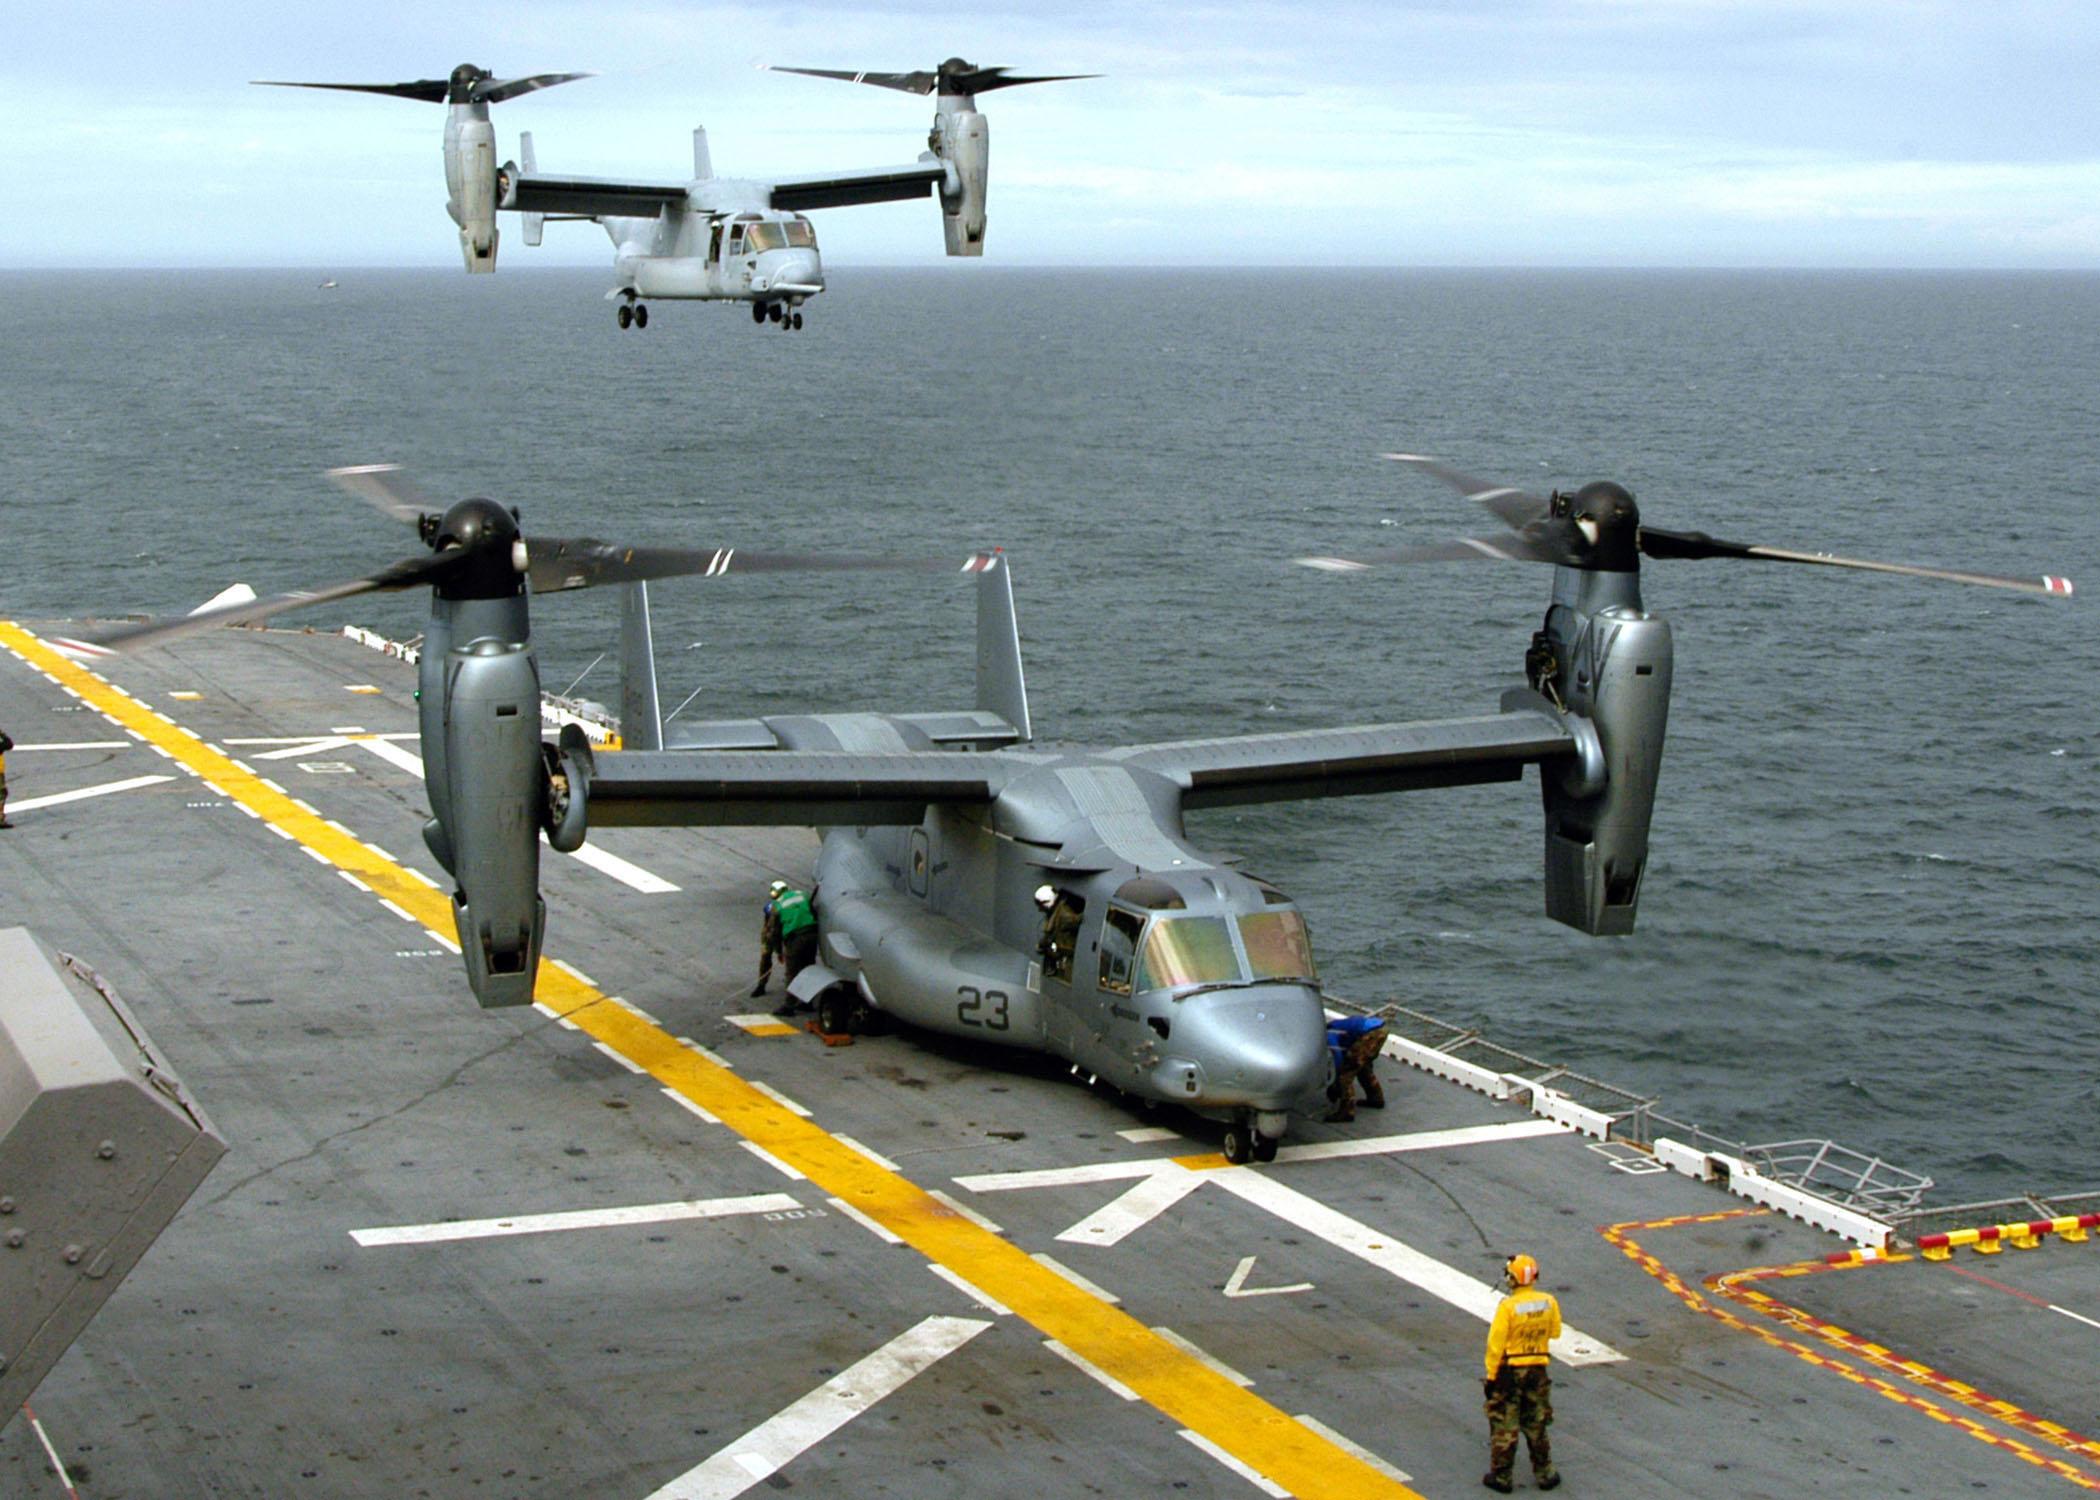 File:MV-22Bs on USS Wasp.jpg - Wikimedia Commons